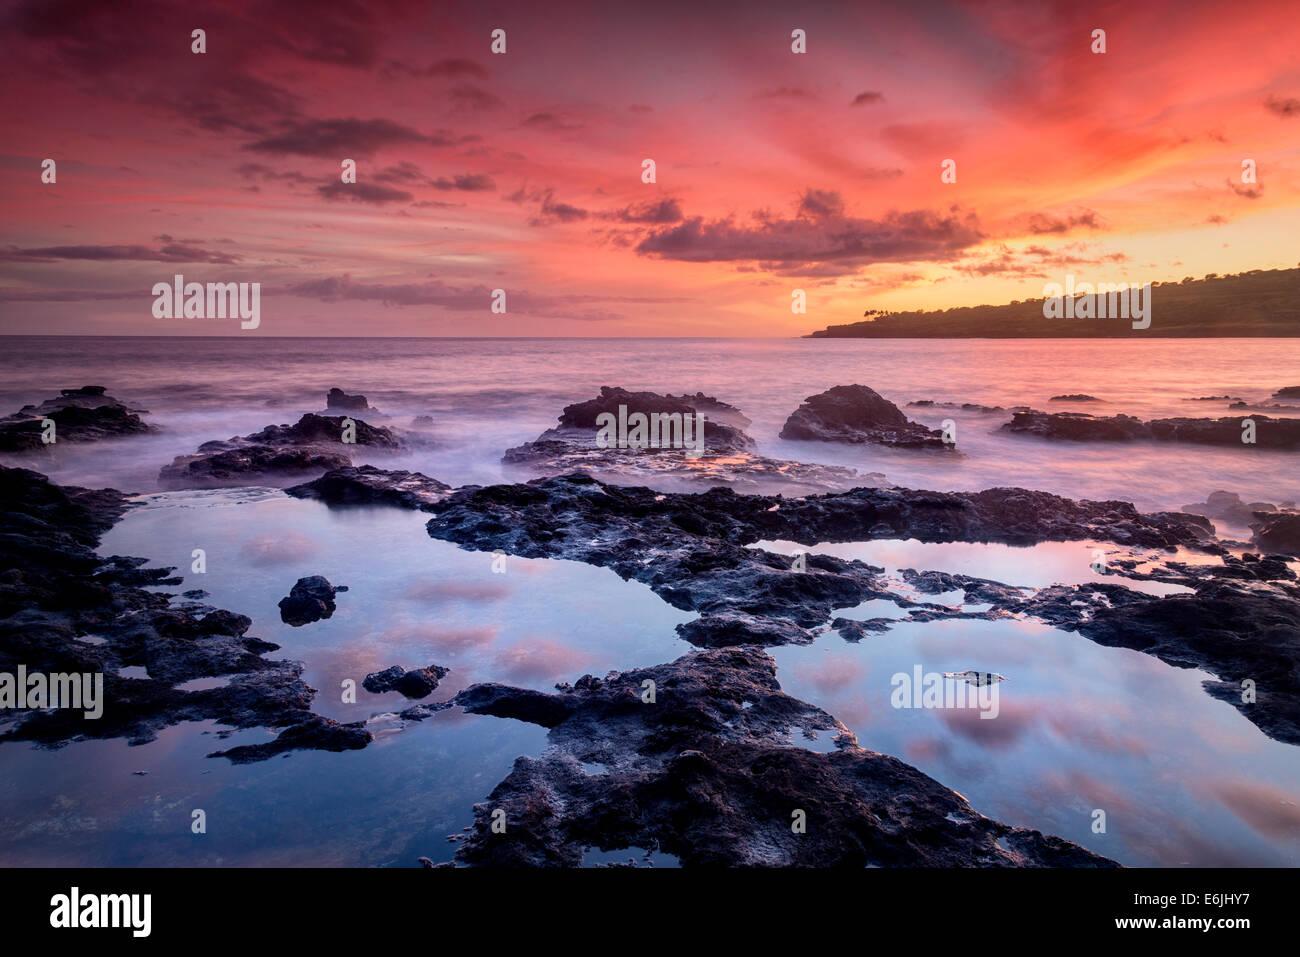 Sunset and tidepools. Lanai, Hawaii Stock Photo